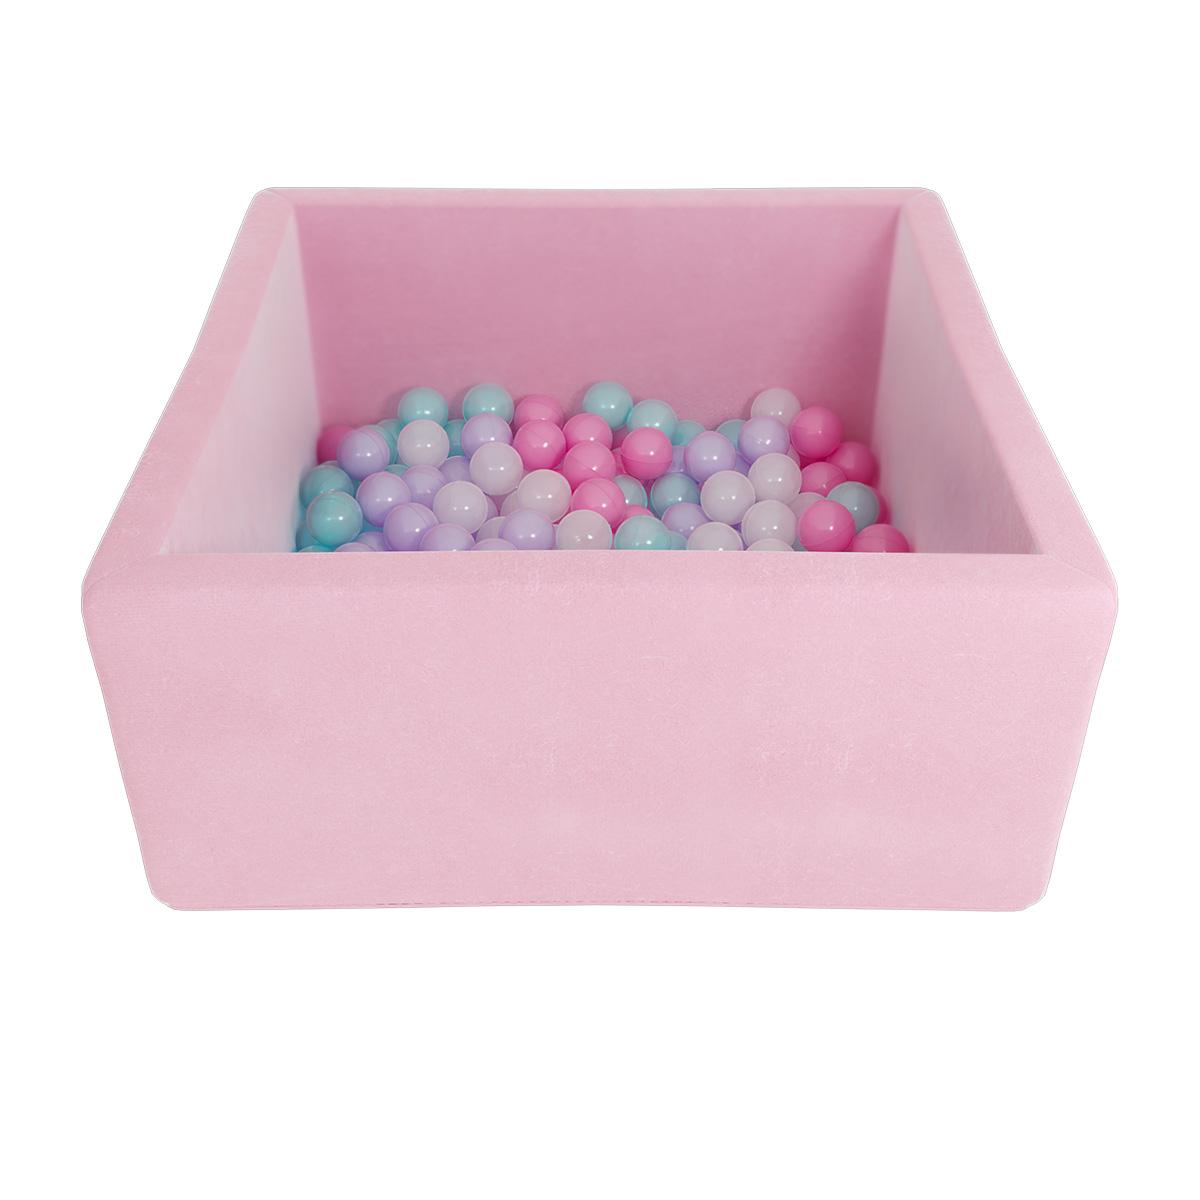 Купить Детский сухой бассейн Romana Airpool Box, розовый + 200 шаров, Romana (Романа)